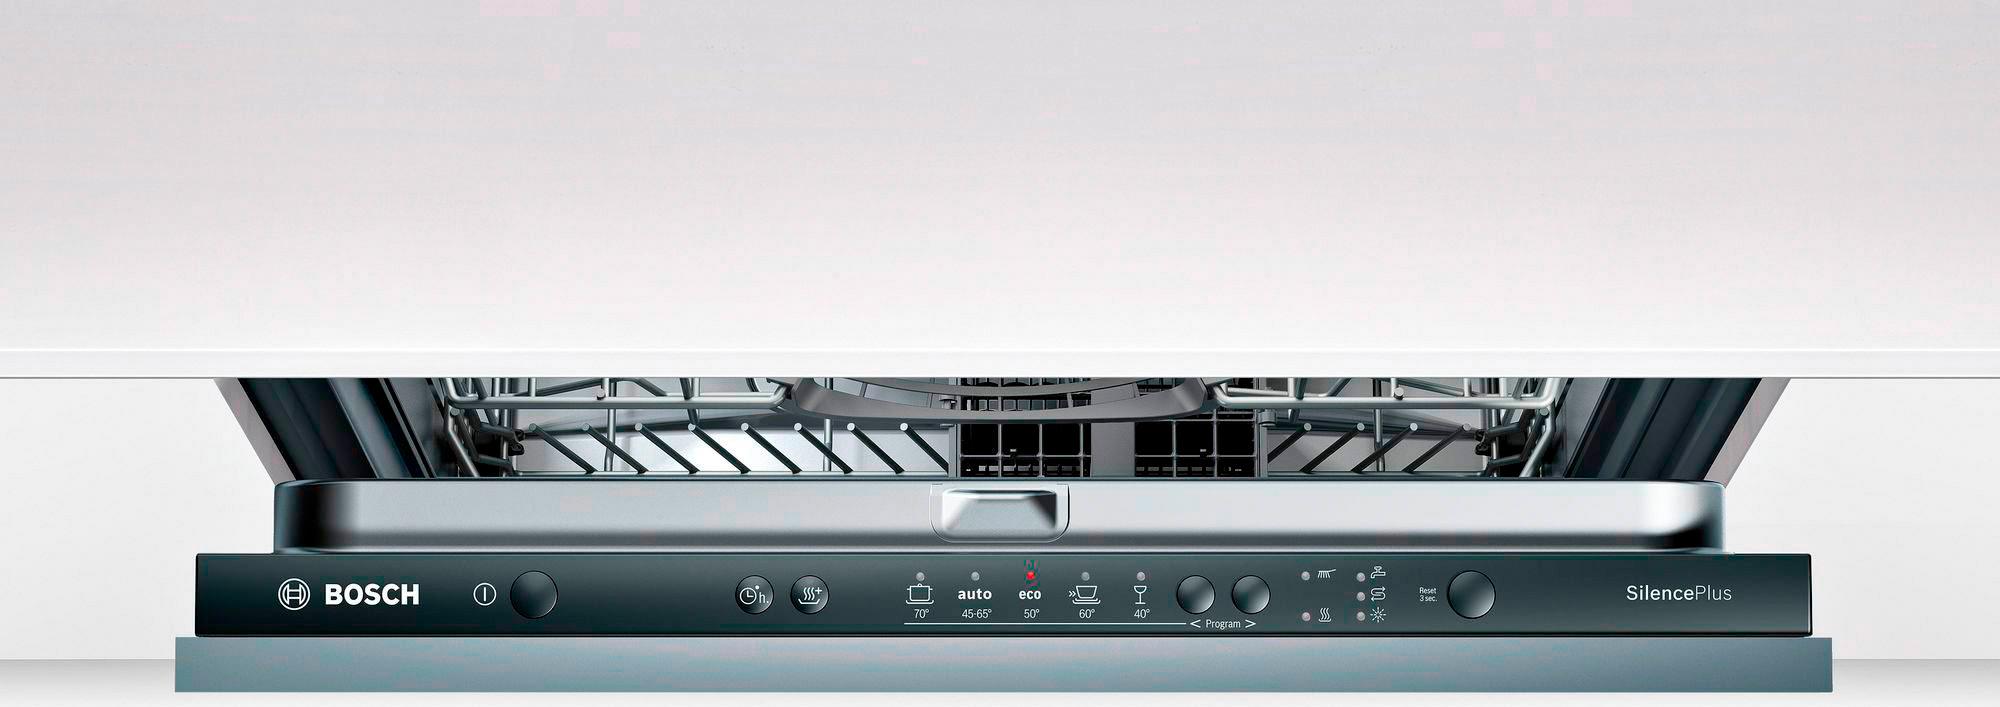 Lavastoviglie Bosch da incasso SMV25CX02E Lavastoviglie incassata ...